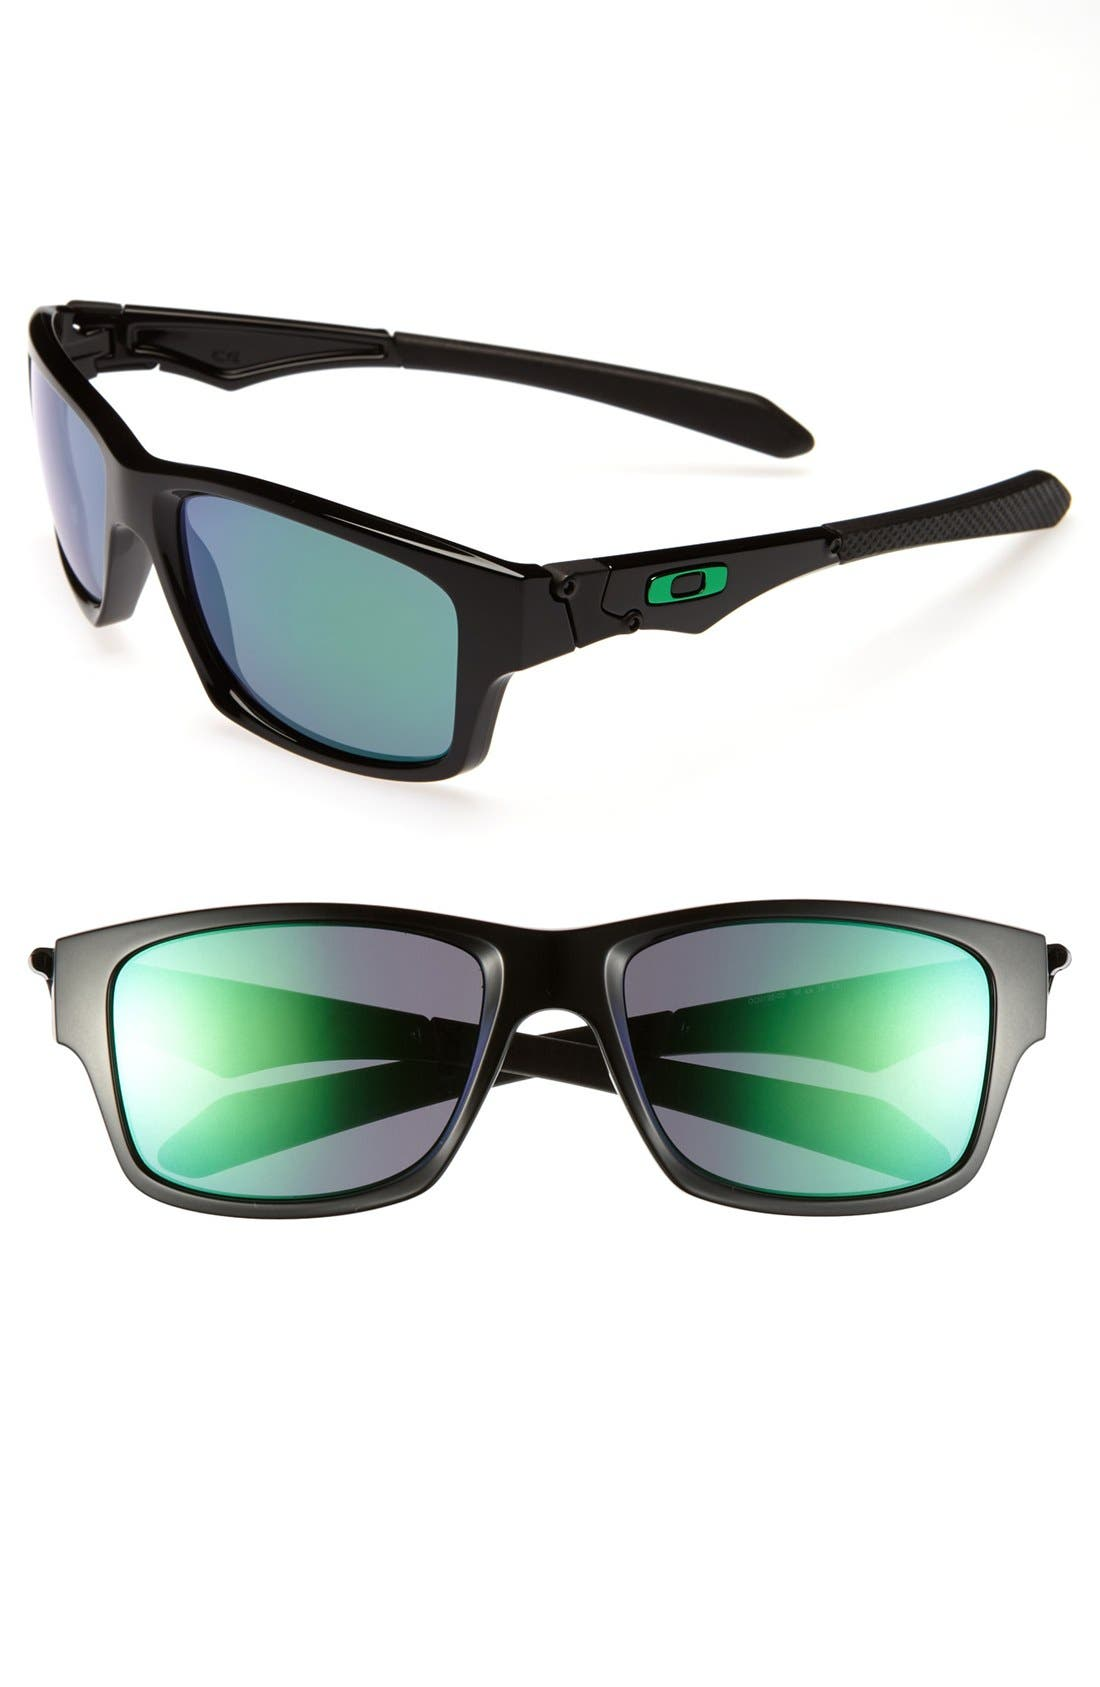 Alternate Image 1 Selected - Oakley 'Jupiter Squared' 56mm Sunglasses